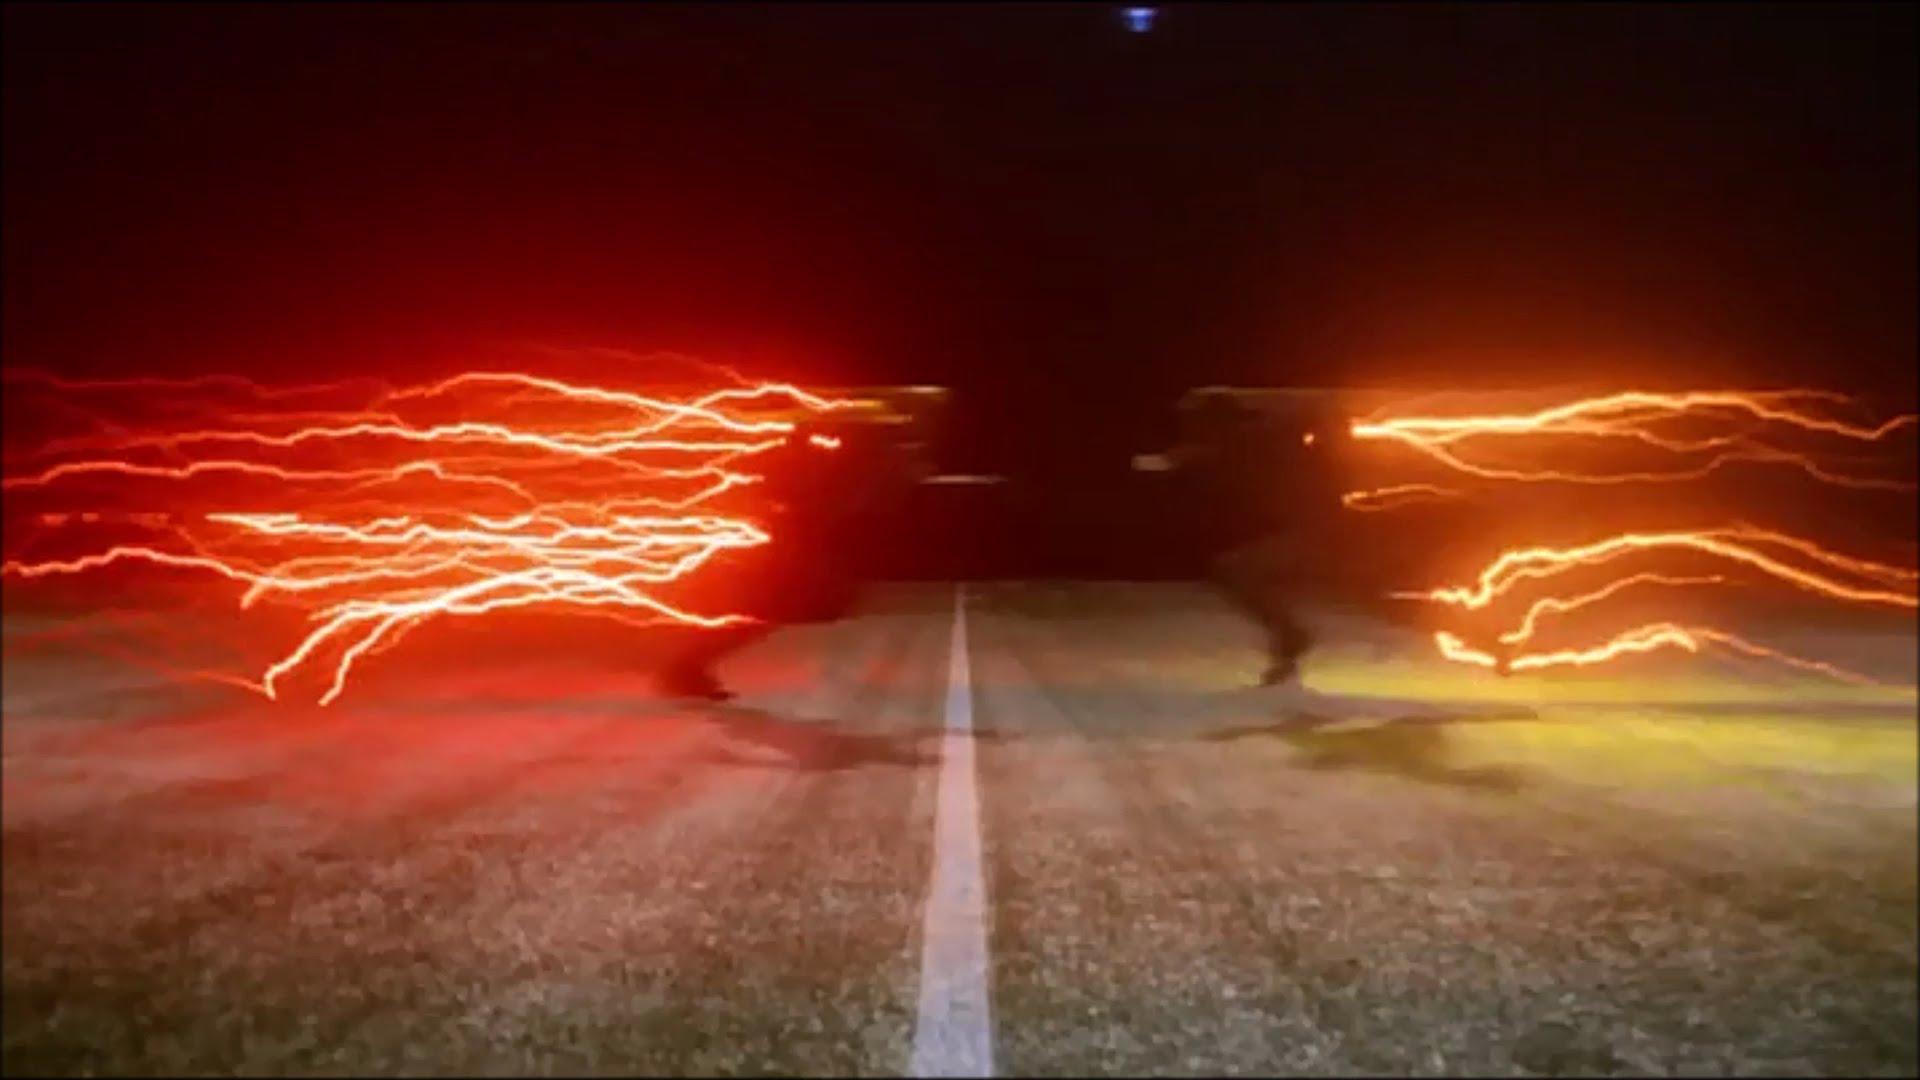 The Flash vs Professor Zoom 1920x1080